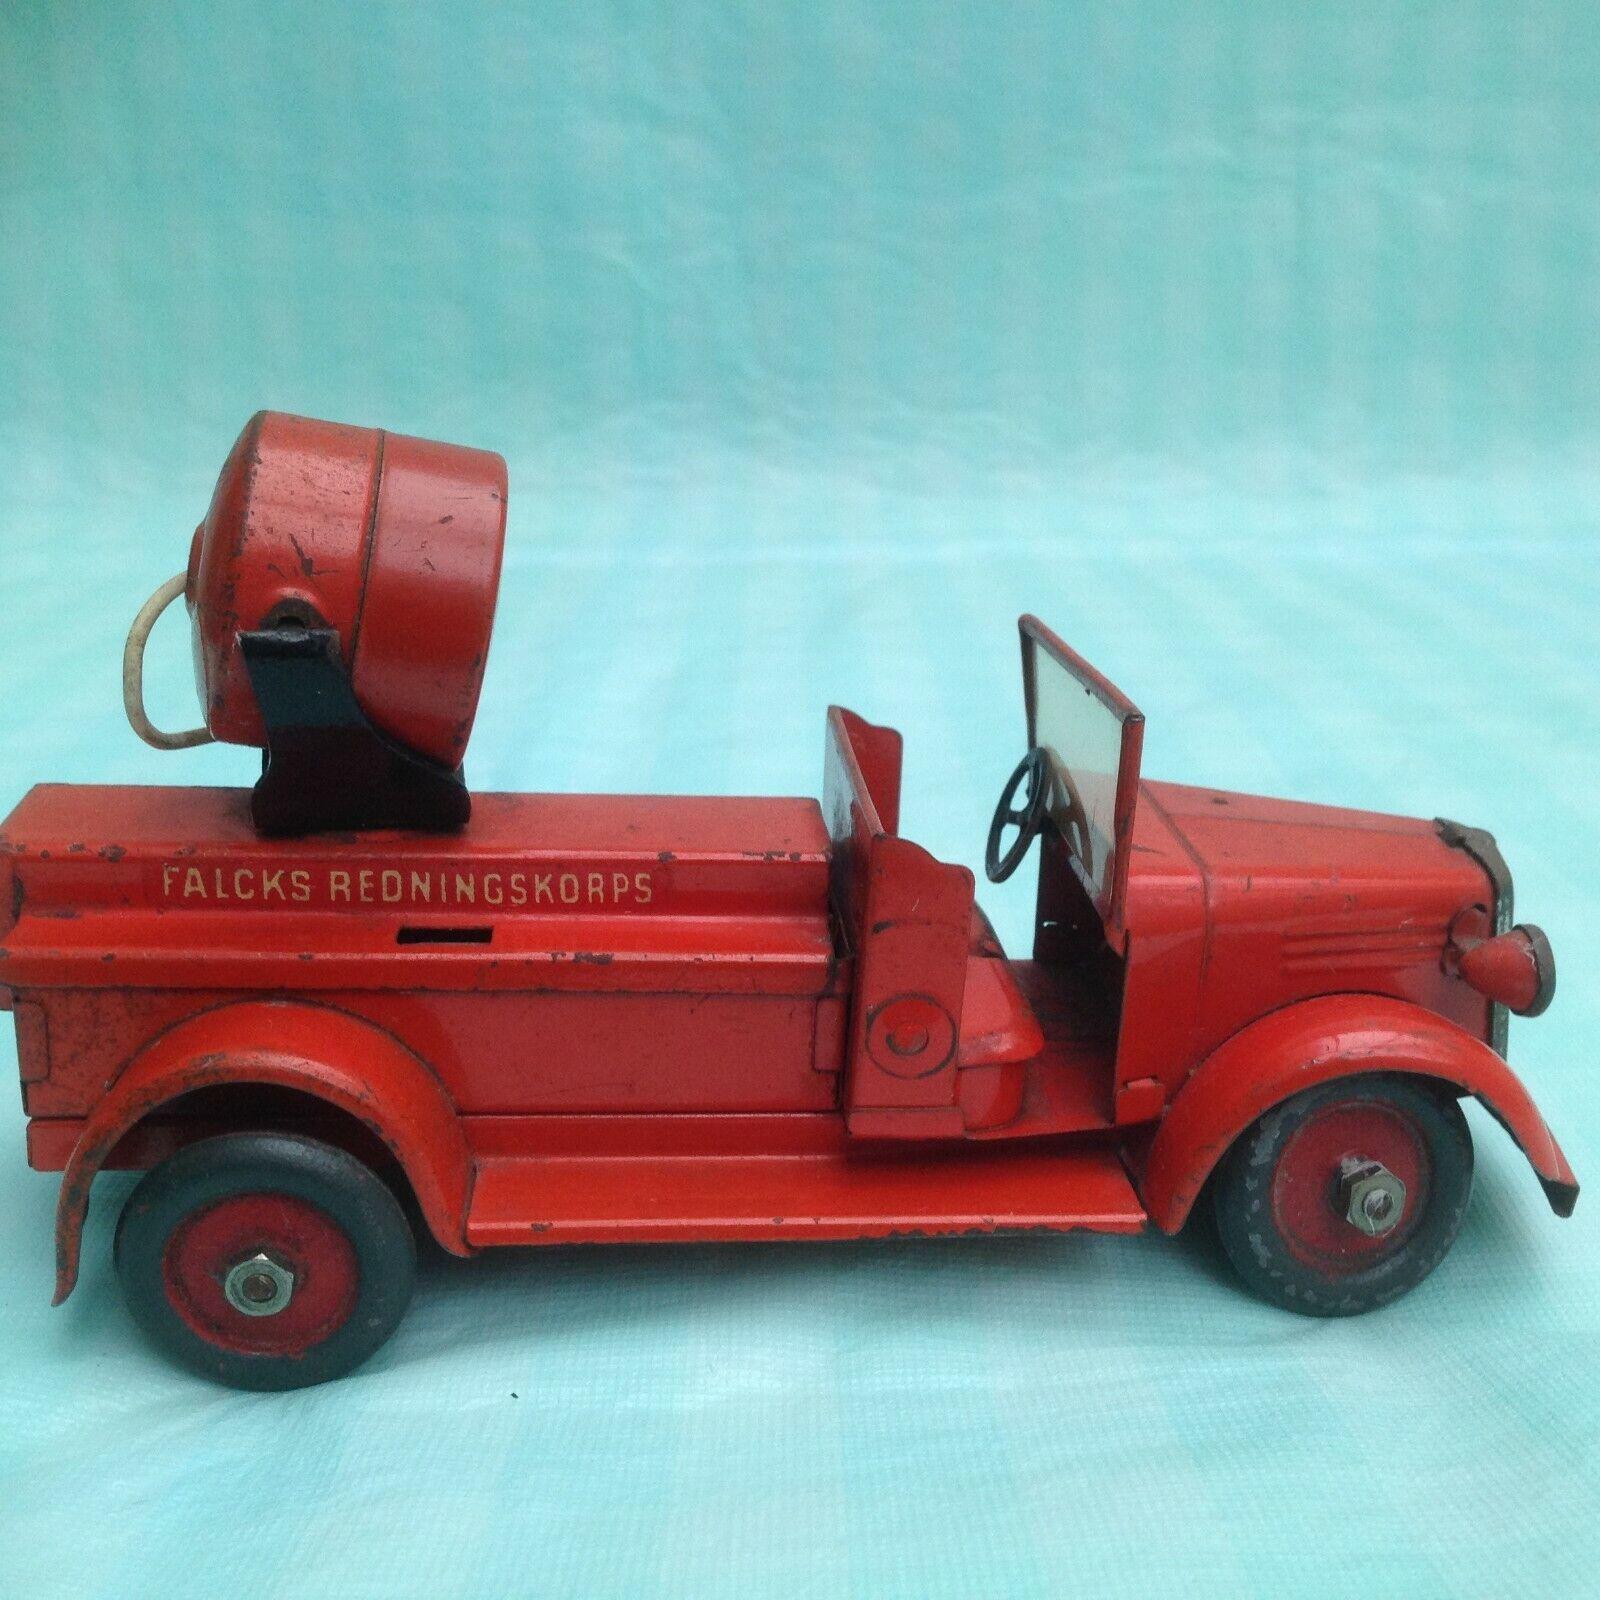 VINTAGE falcks rossoningskorps latta camion dei pompieri con luce di ricerca